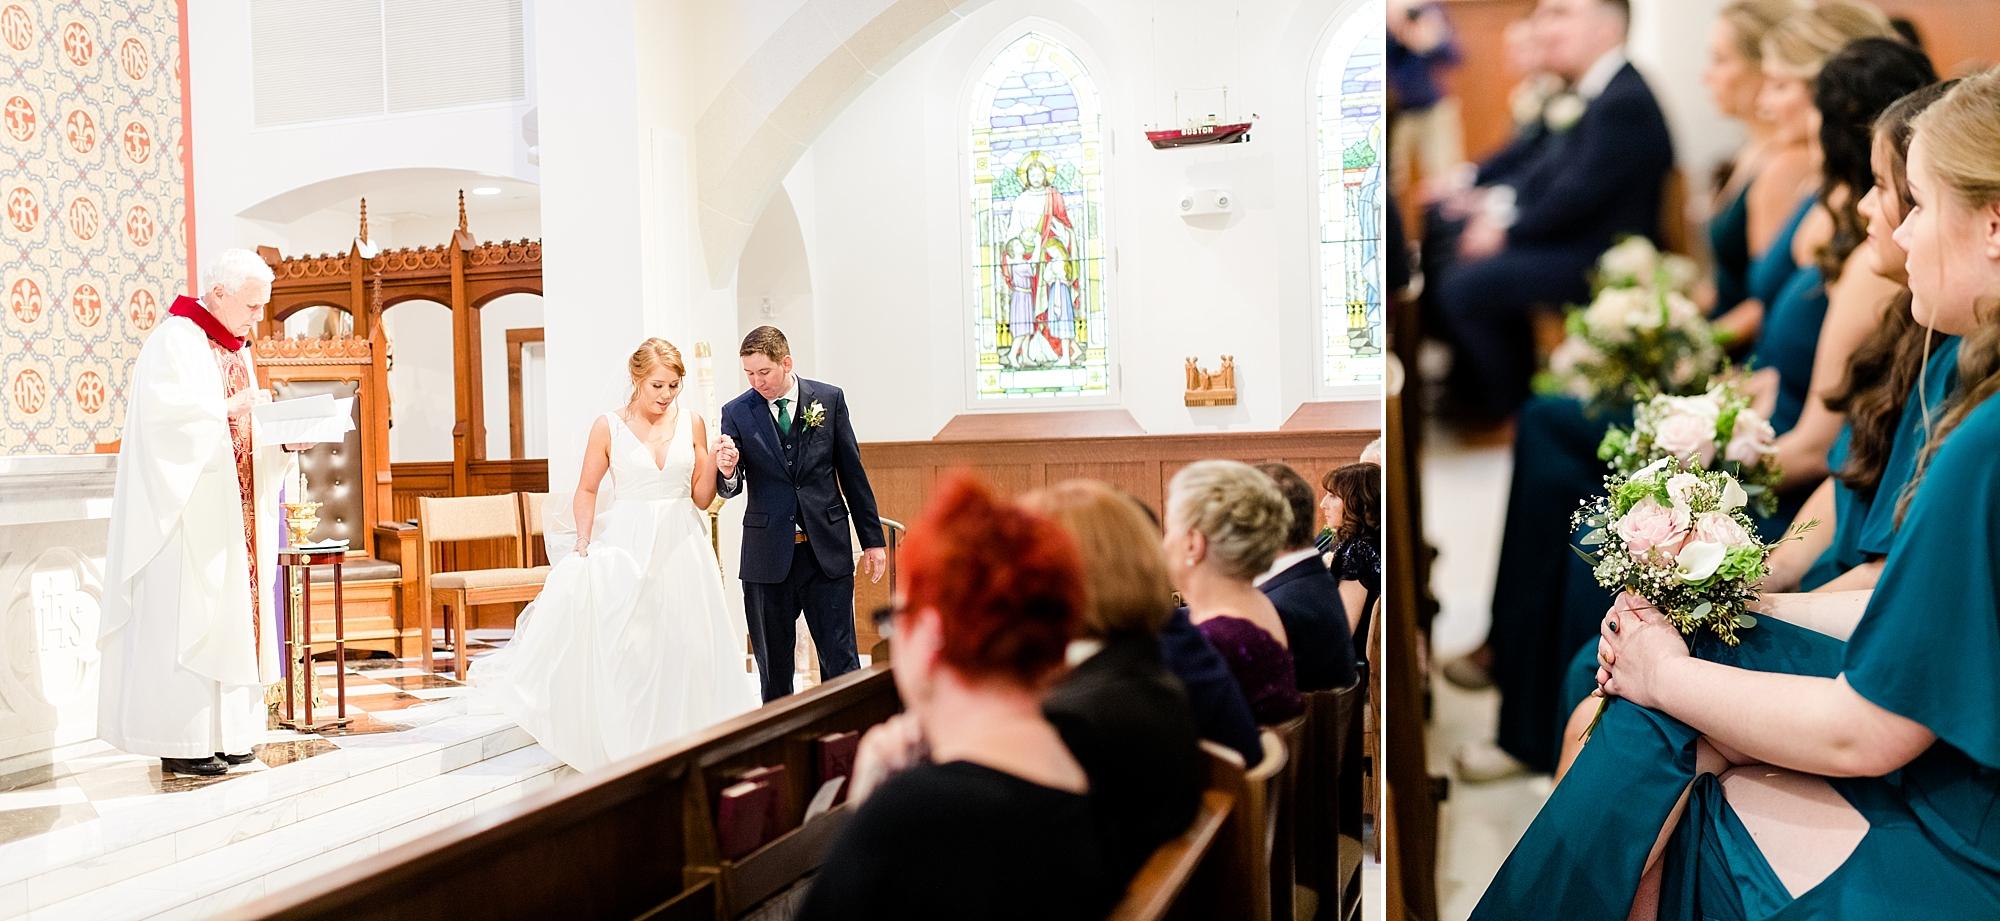 eisleyimages-irish-wedding-boston-seaport_0071.jpg